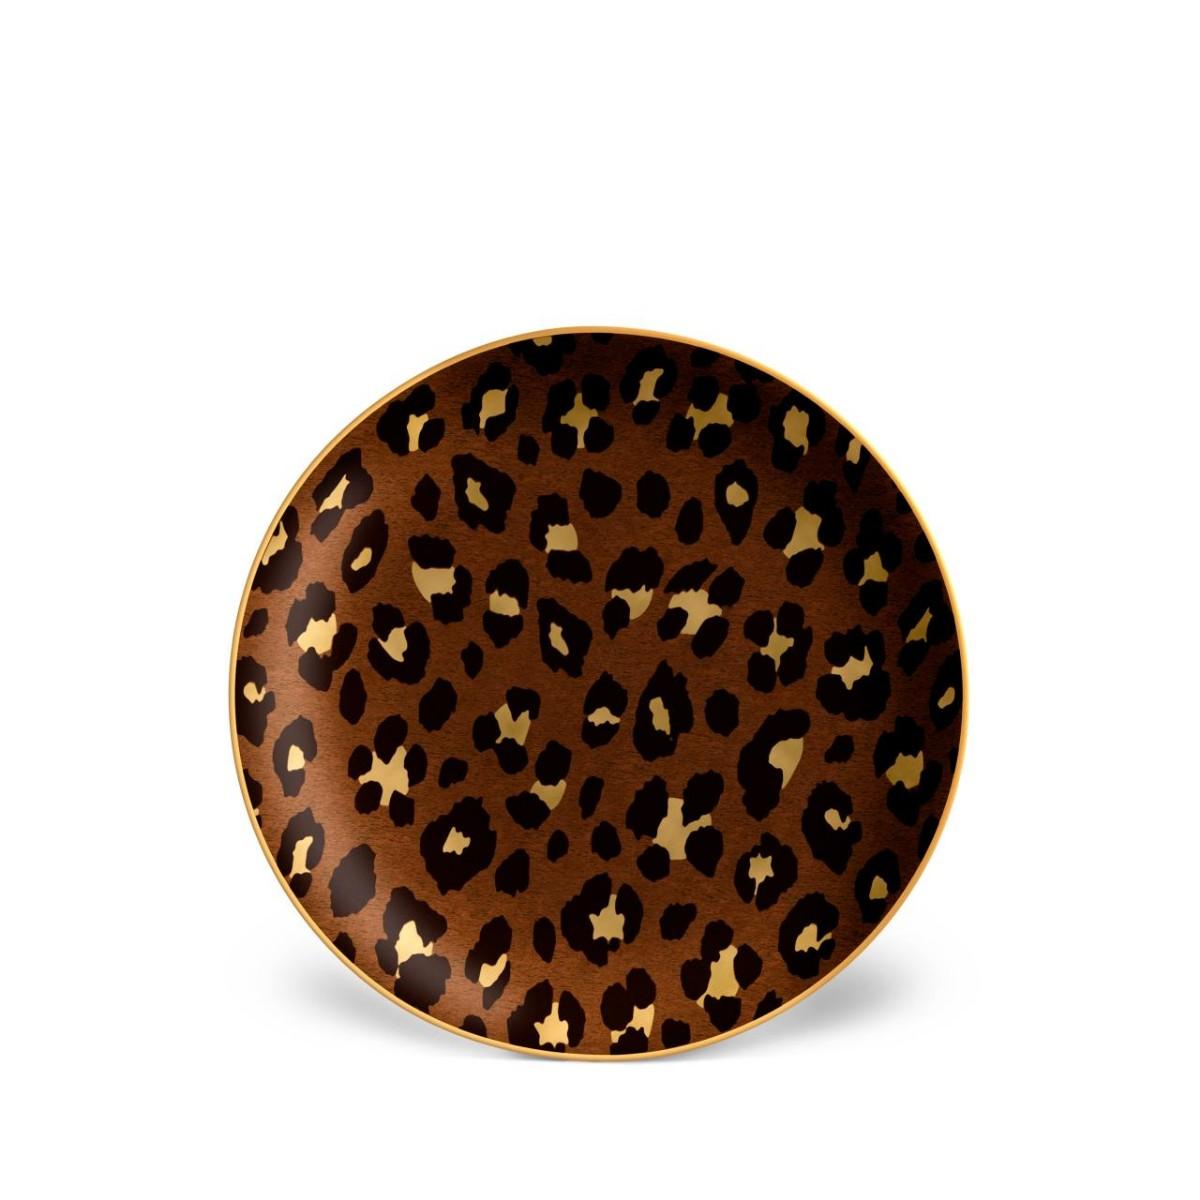 L'Objet I Leopard Dessert Plates (Set of 4)